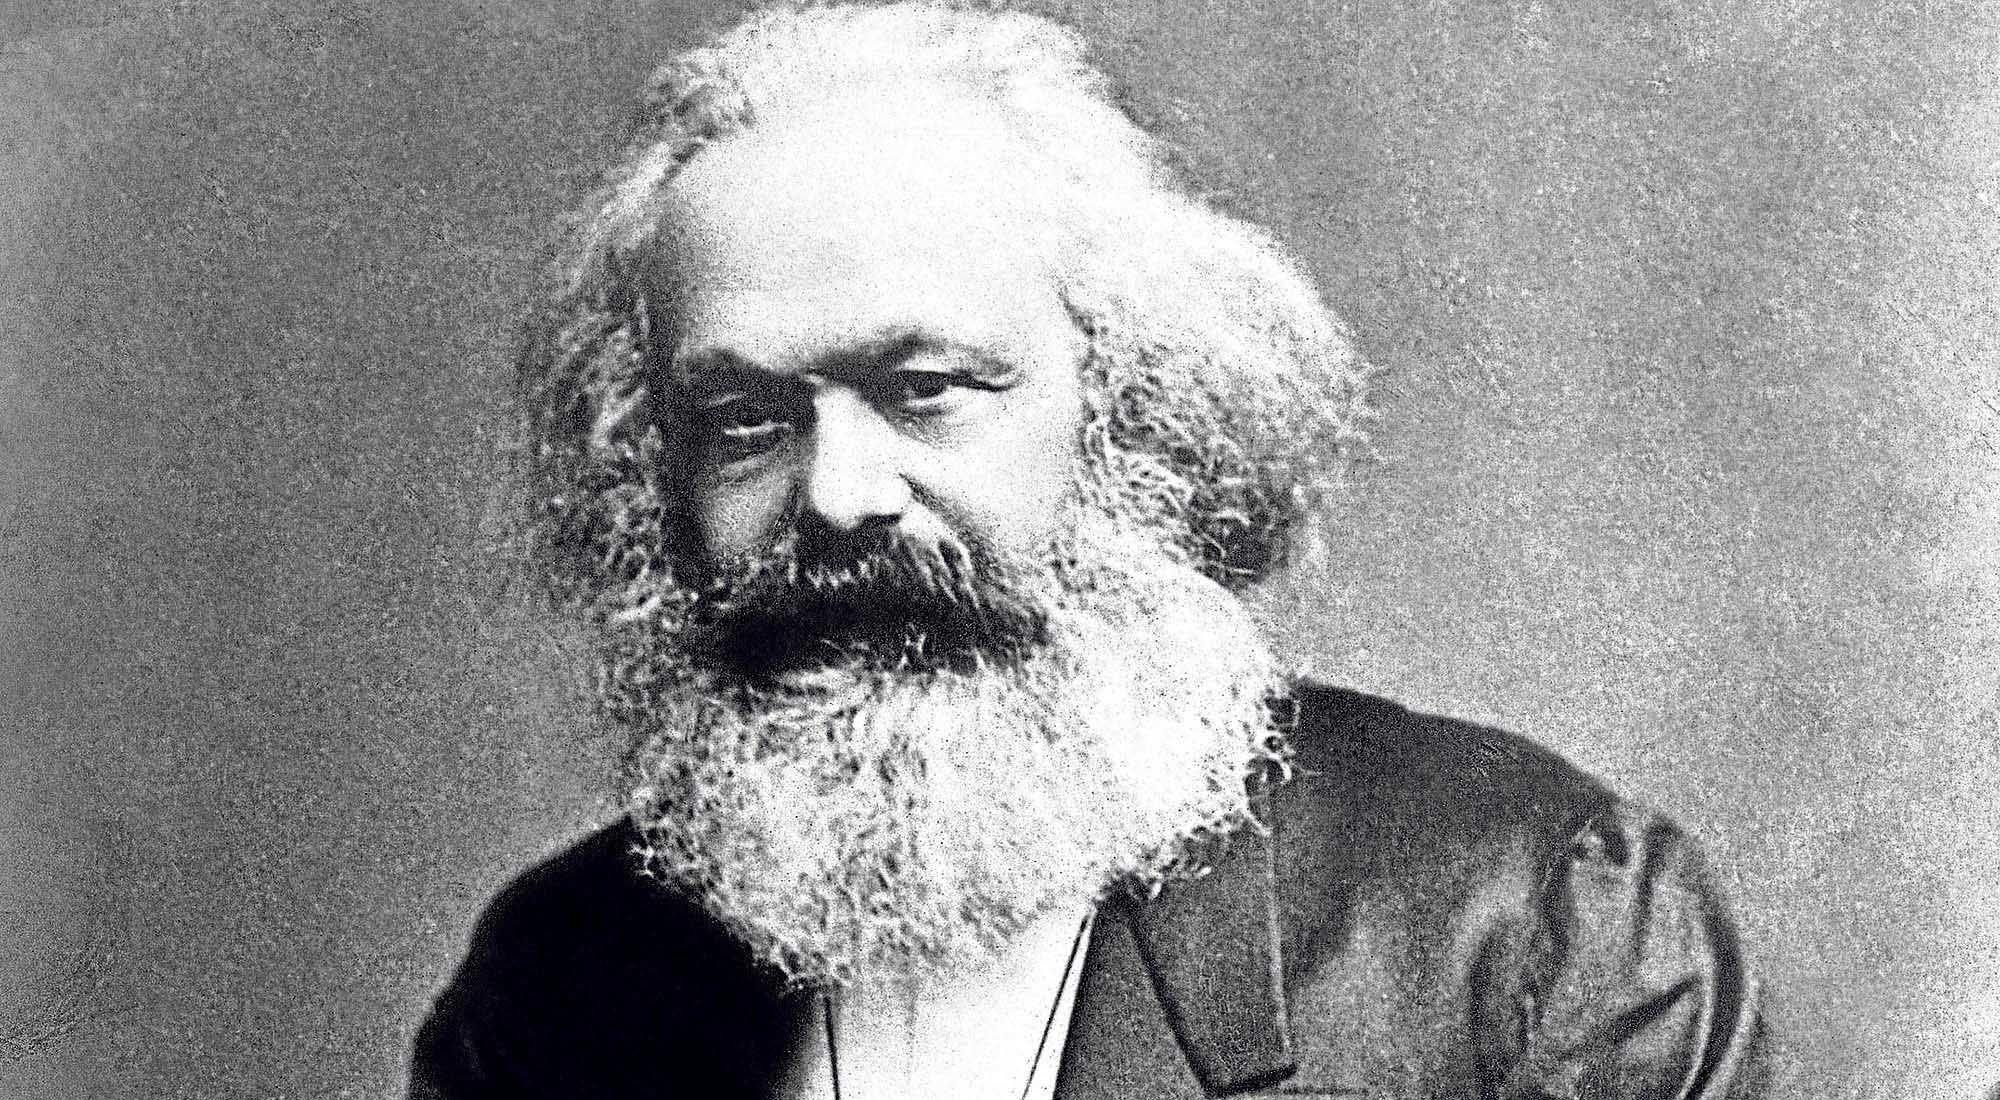 Karl Heinrich Marx (Tréveris, 1818 - Londres, 1883)